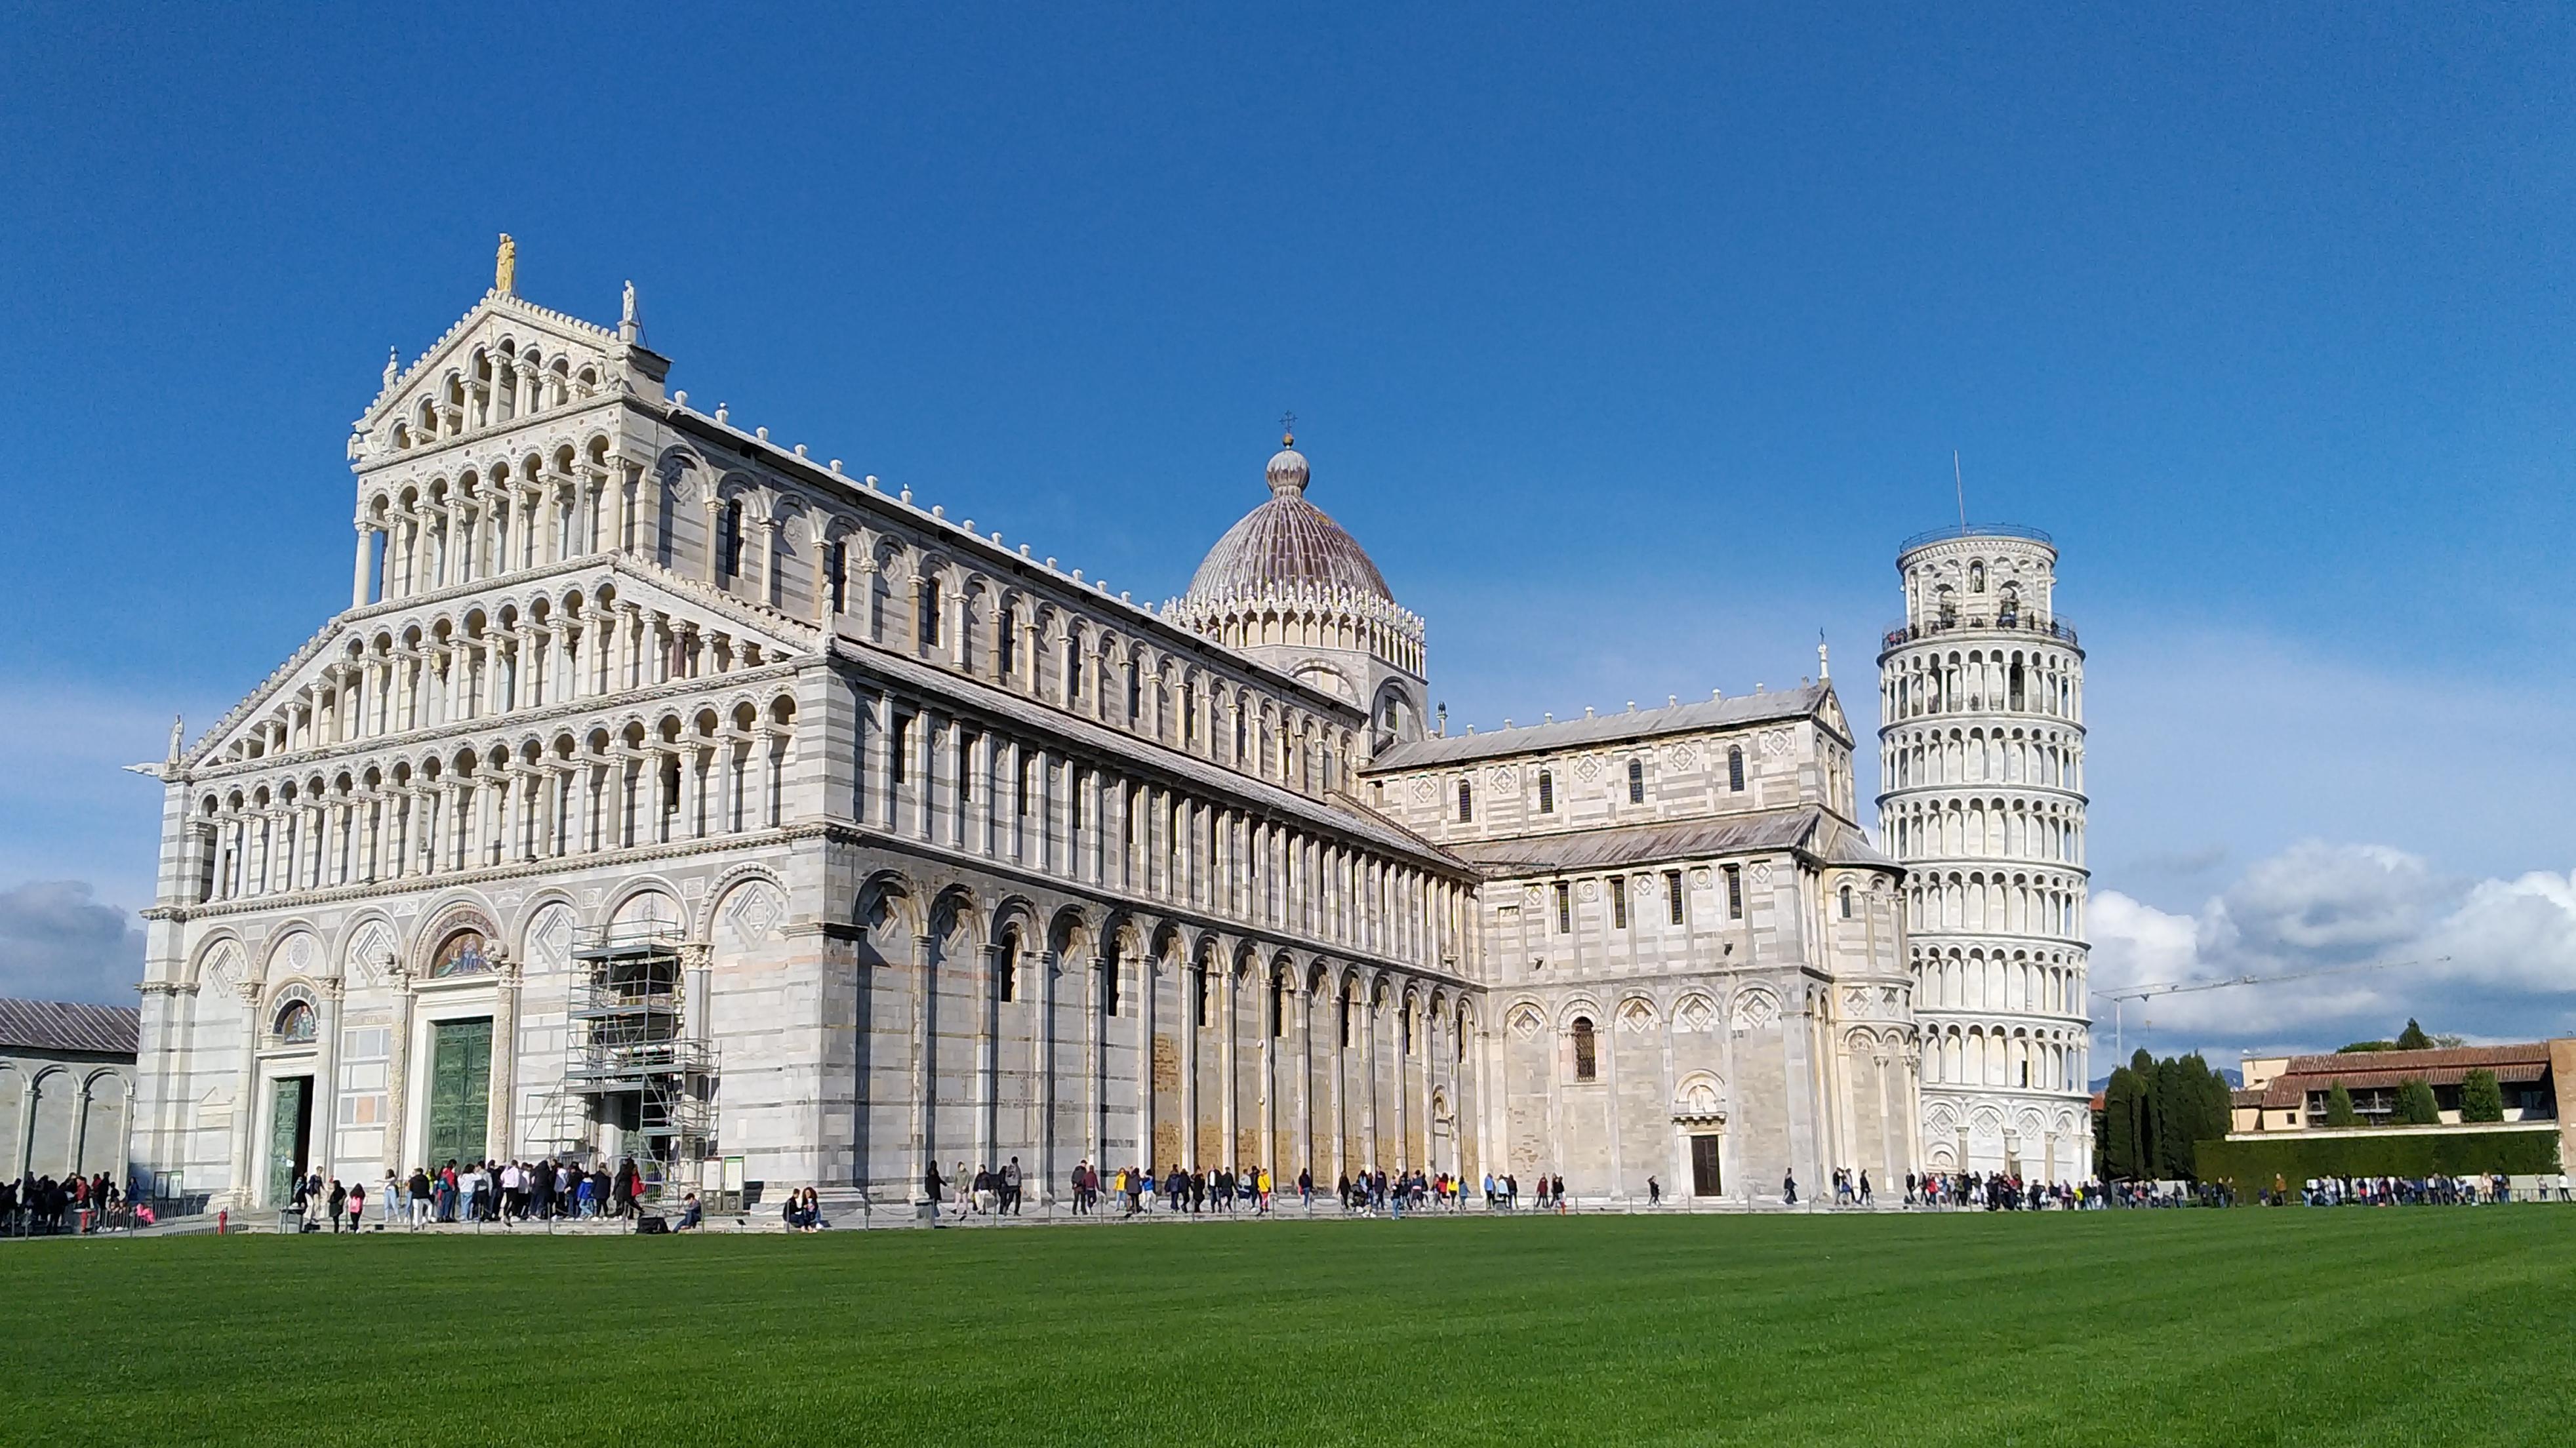 Toskania Piza (Pisa)